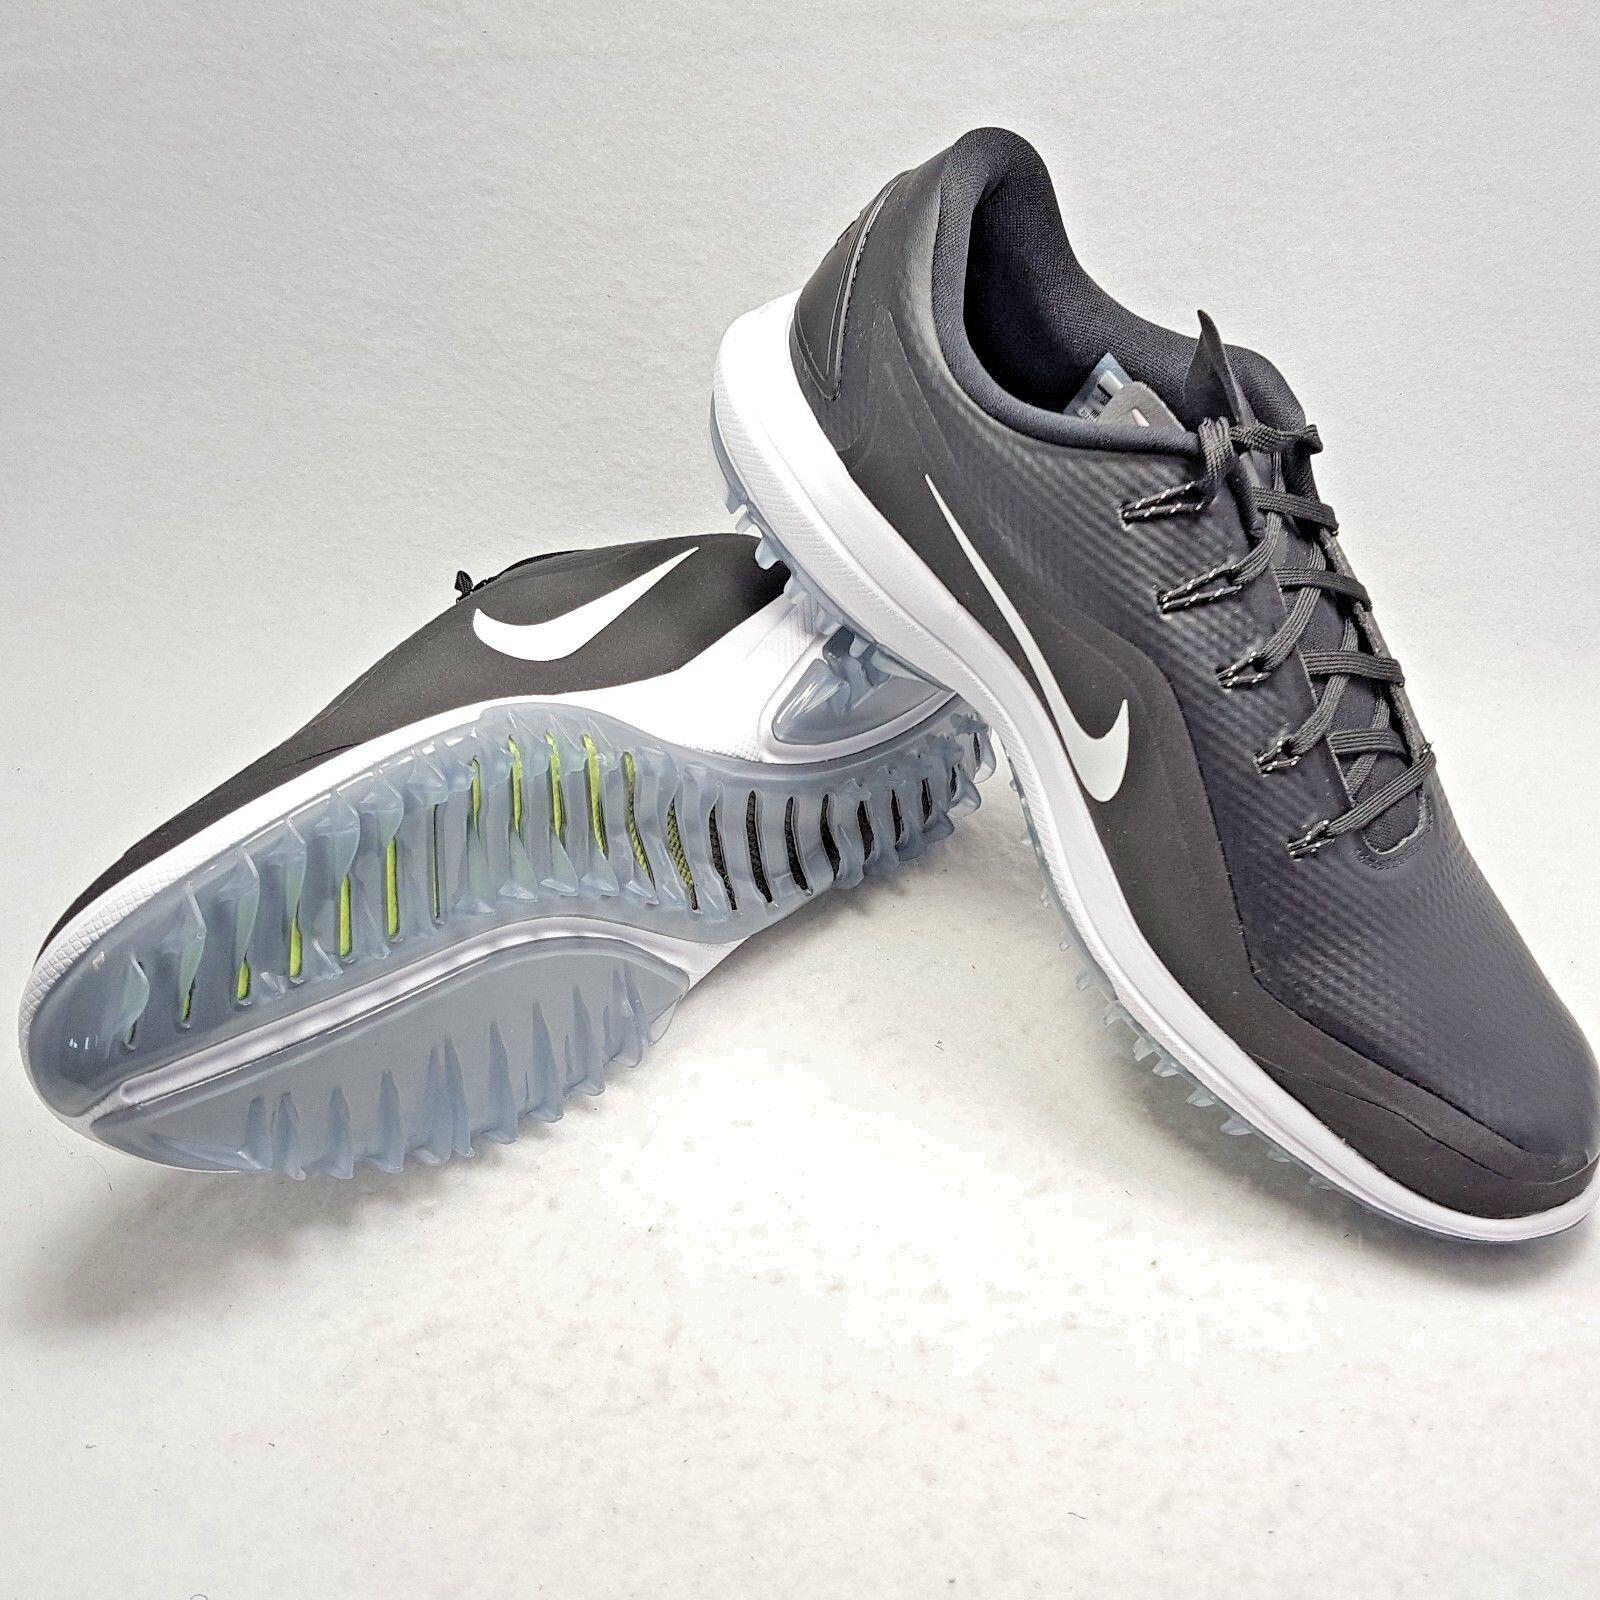 175 New Nike 2018 Lunar Control Vapor 2 Golf Shoes White Black Men's Size 13